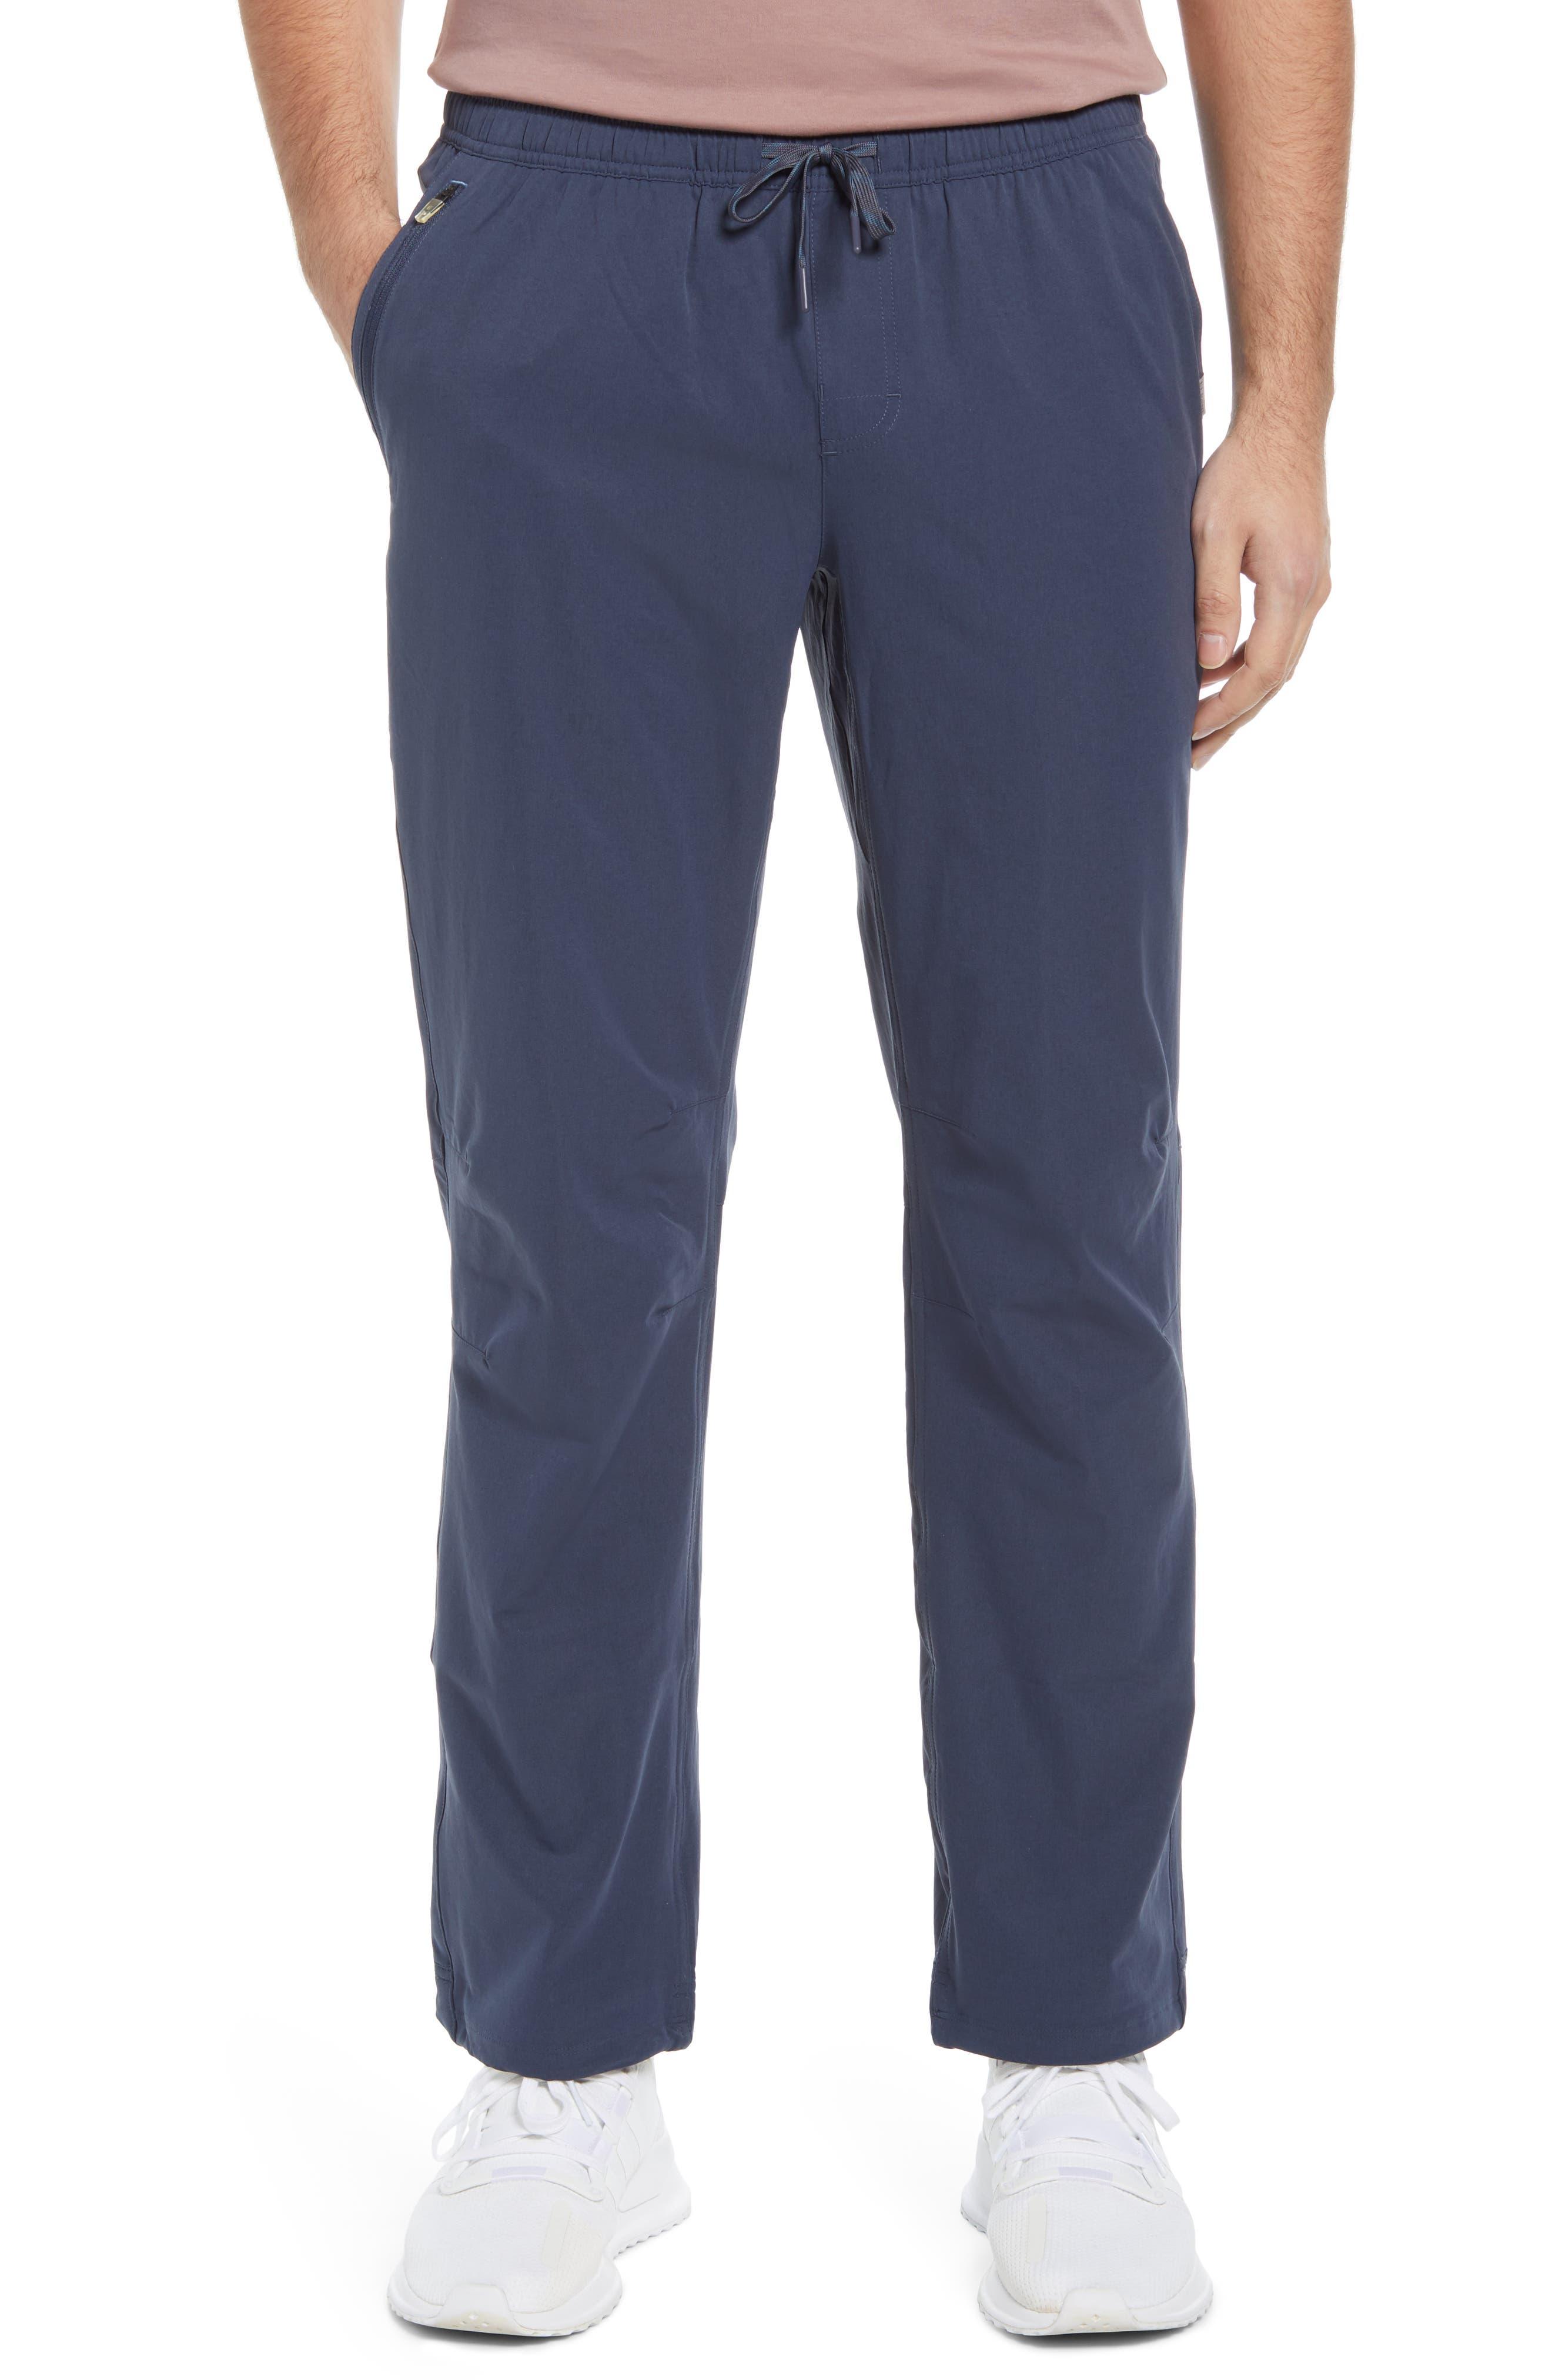 Men's Multisport Pants